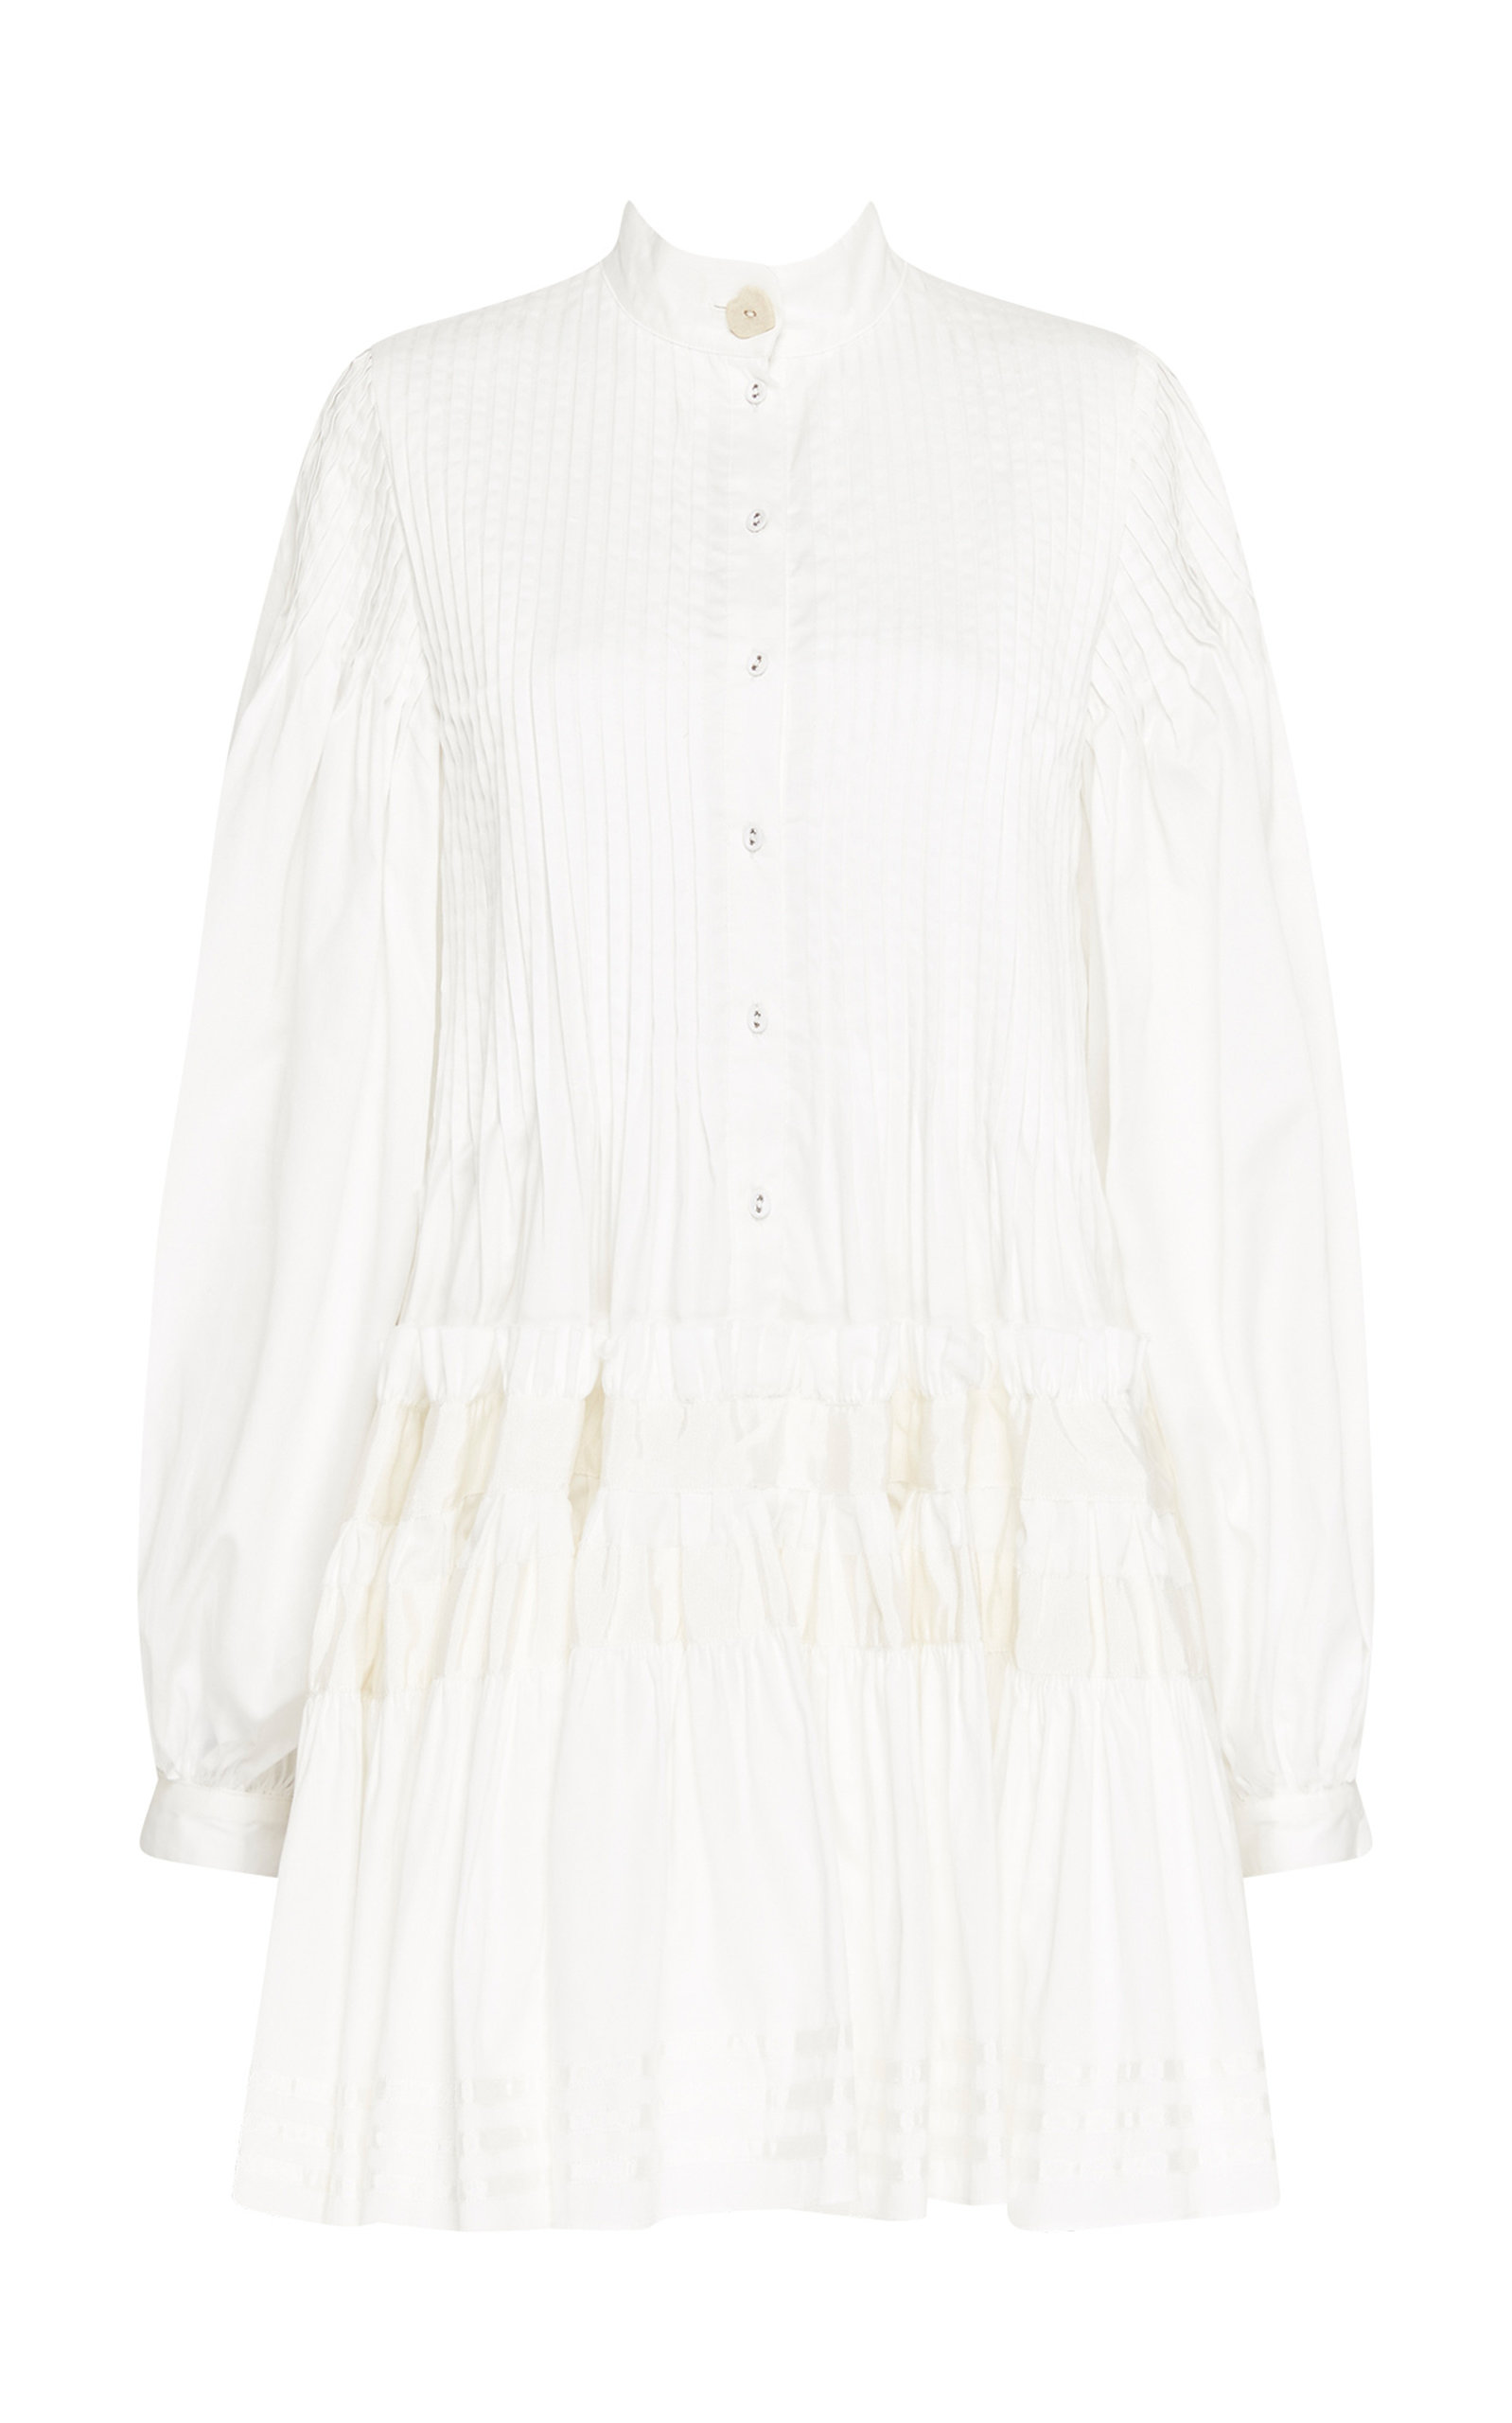 - Women's Run Free Pin-Tucked Cotton Mini Dress